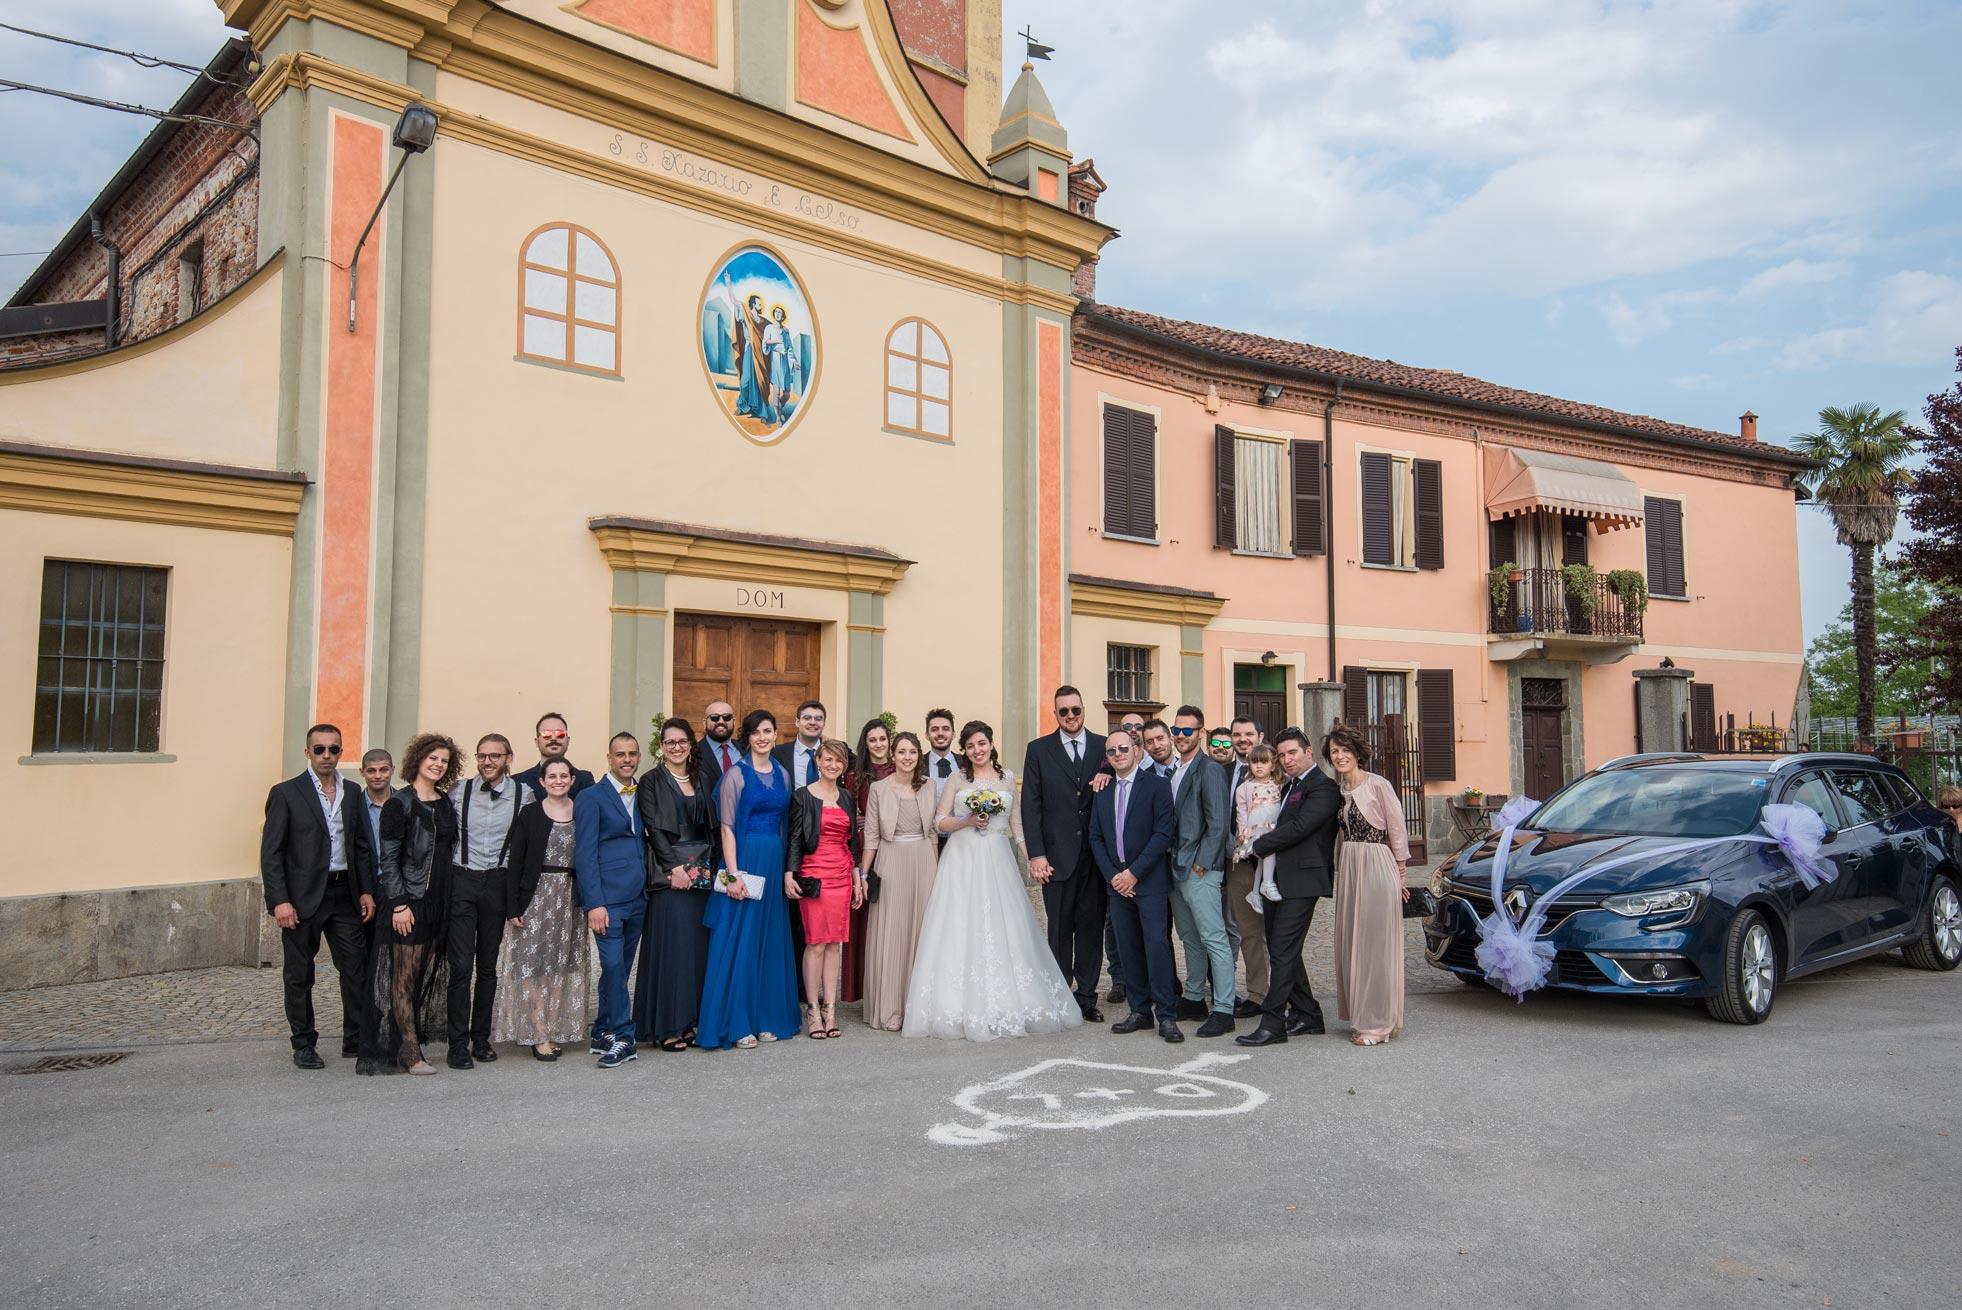 Matrimonio a Narzole Lorenza Diego - DSC 0657 - Fotografie matrimonio chiesa - Fotografie matrimonio chiesa